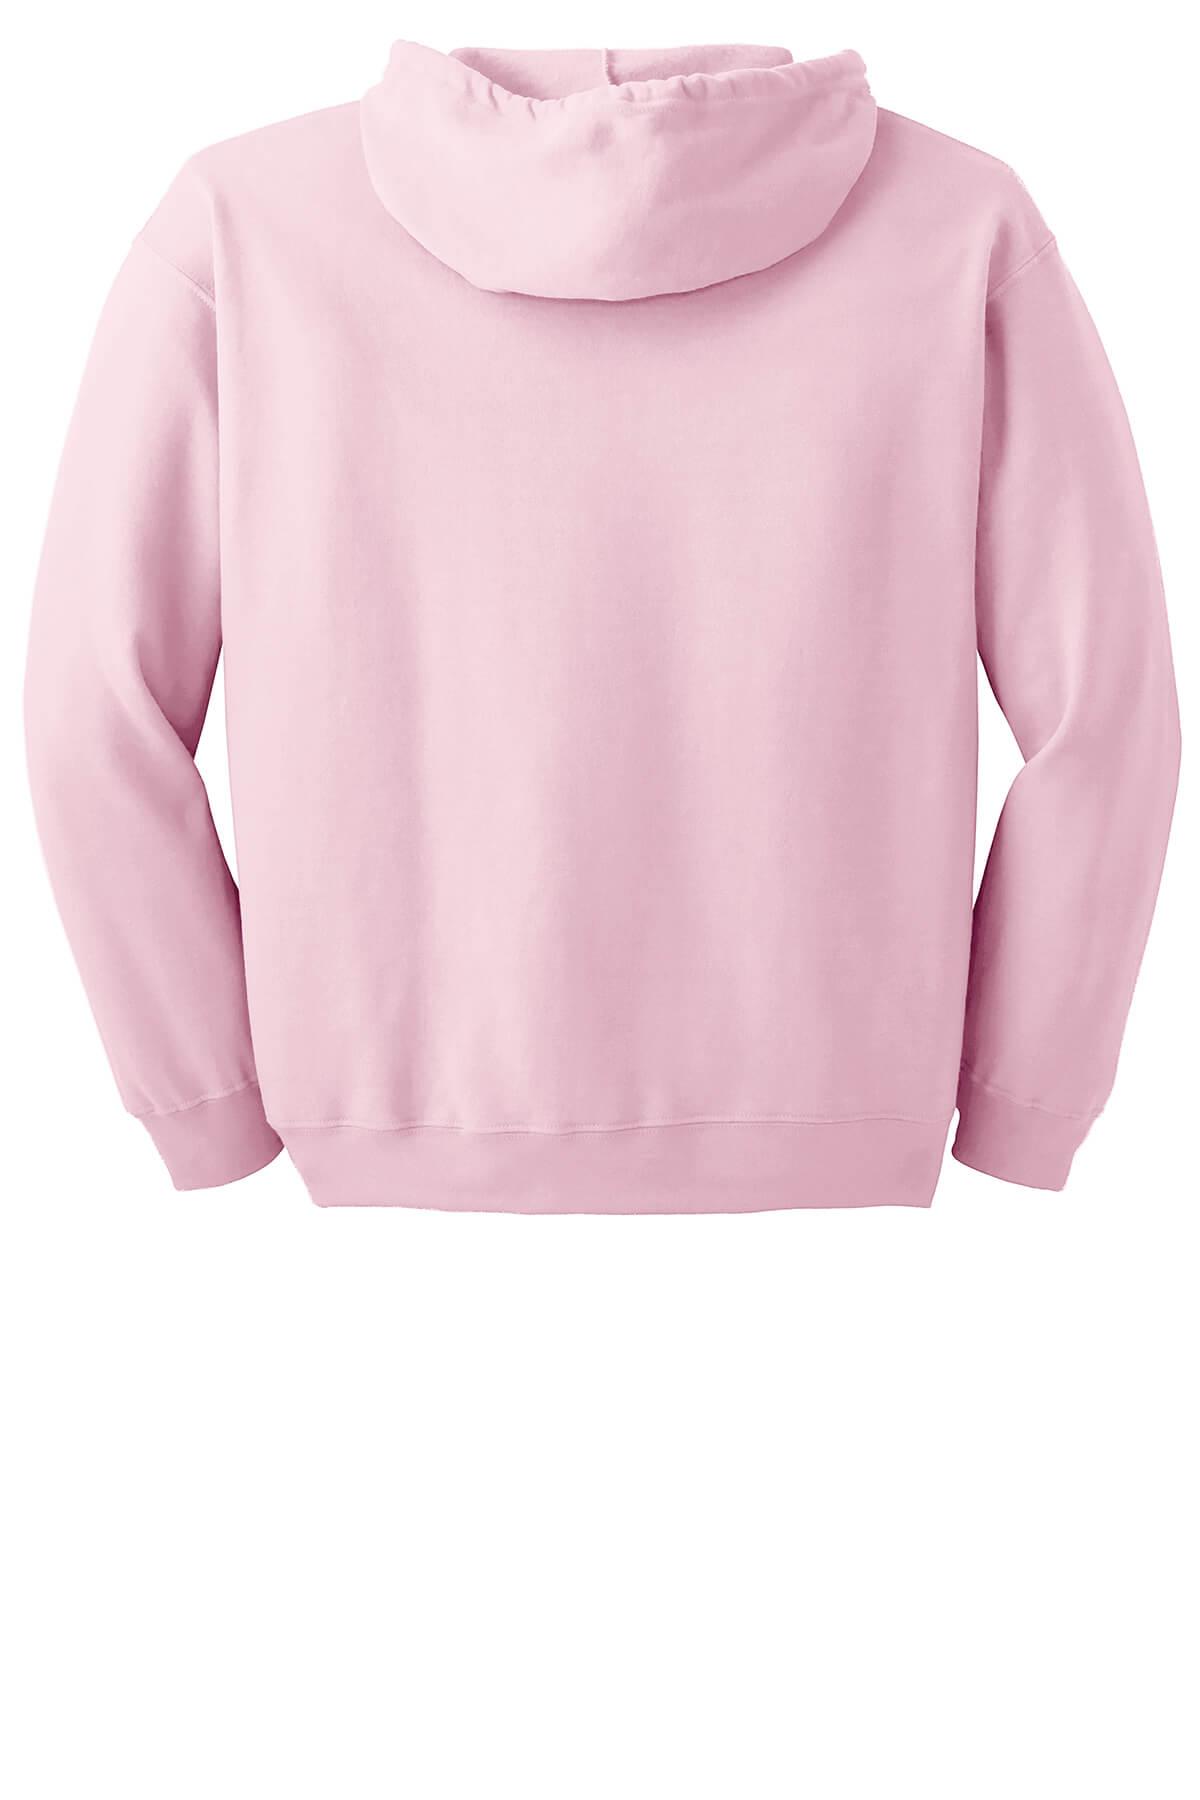 18600-light-pink-6